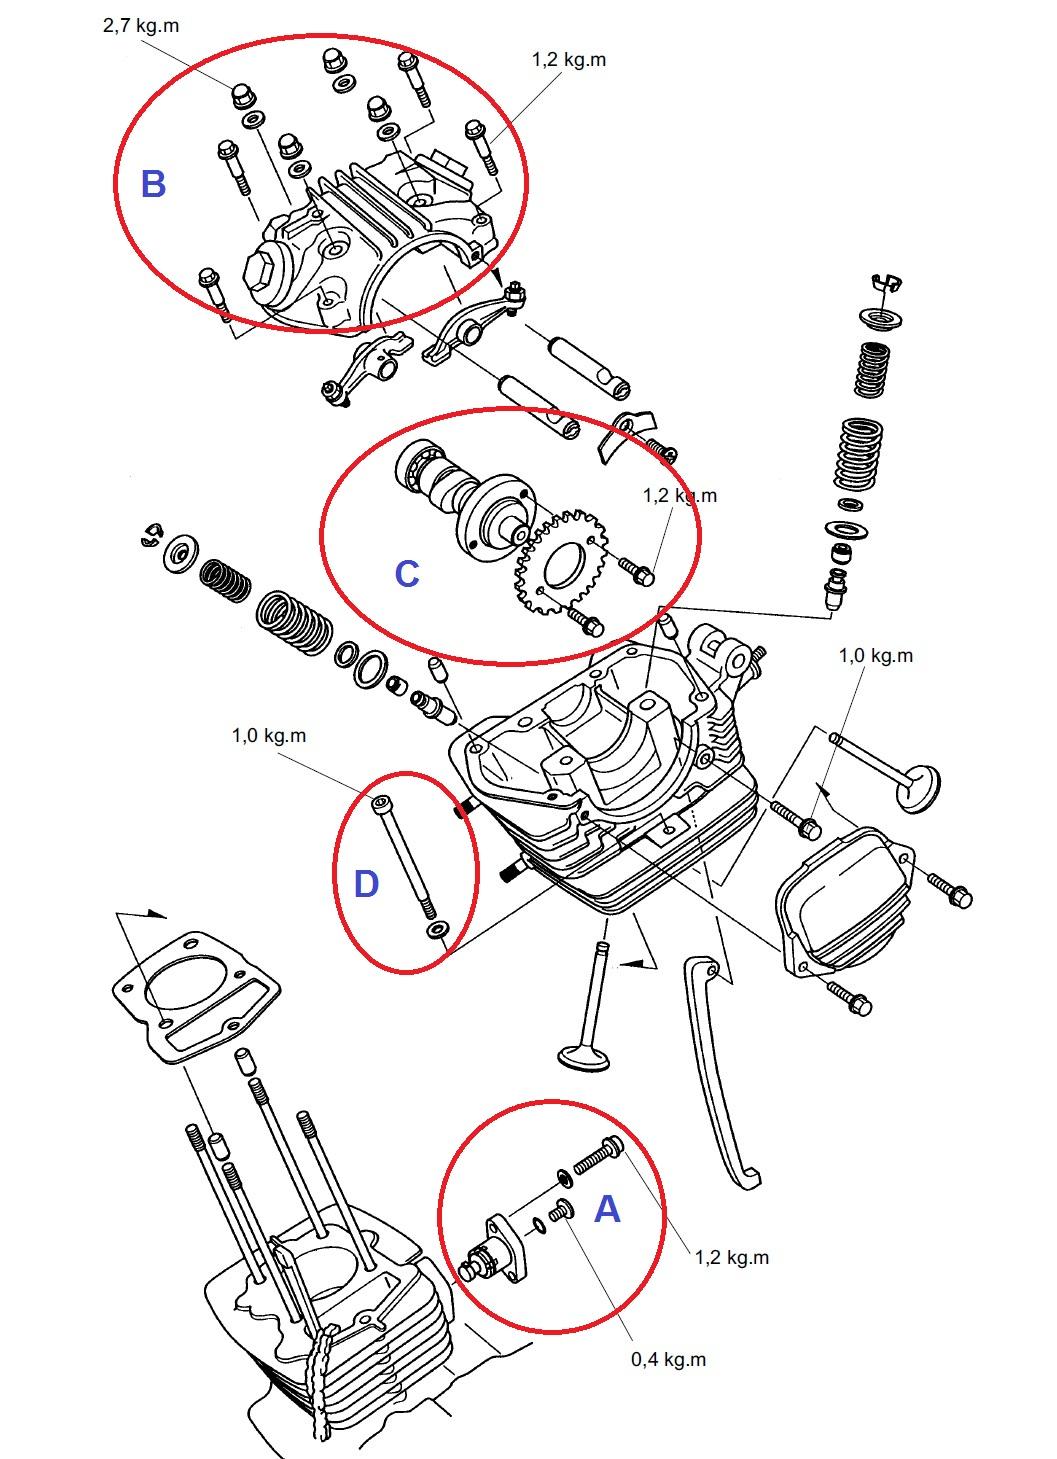 Wire Diagram: Jalur Kabel Body Gl Pro Neotech